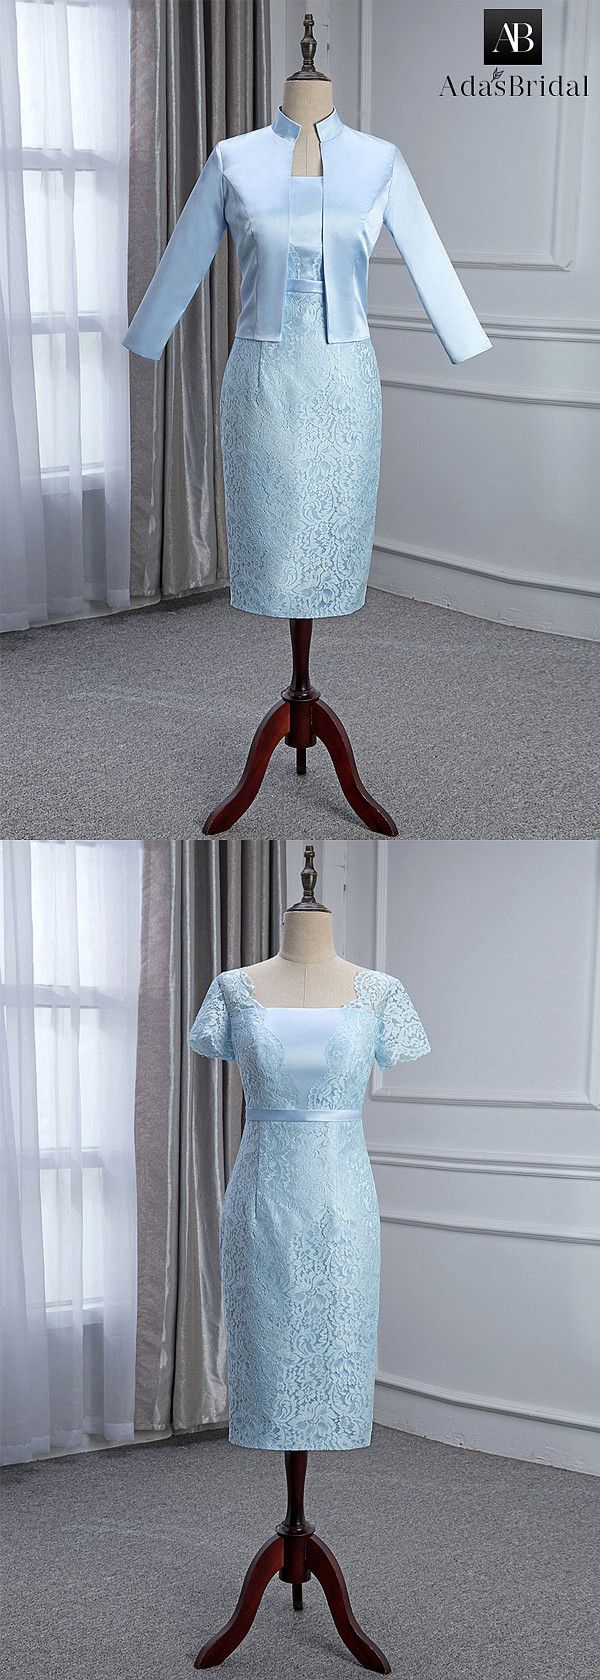 Elegant Lace & Satin Square Neckline Knee-length Sheath/Column ...